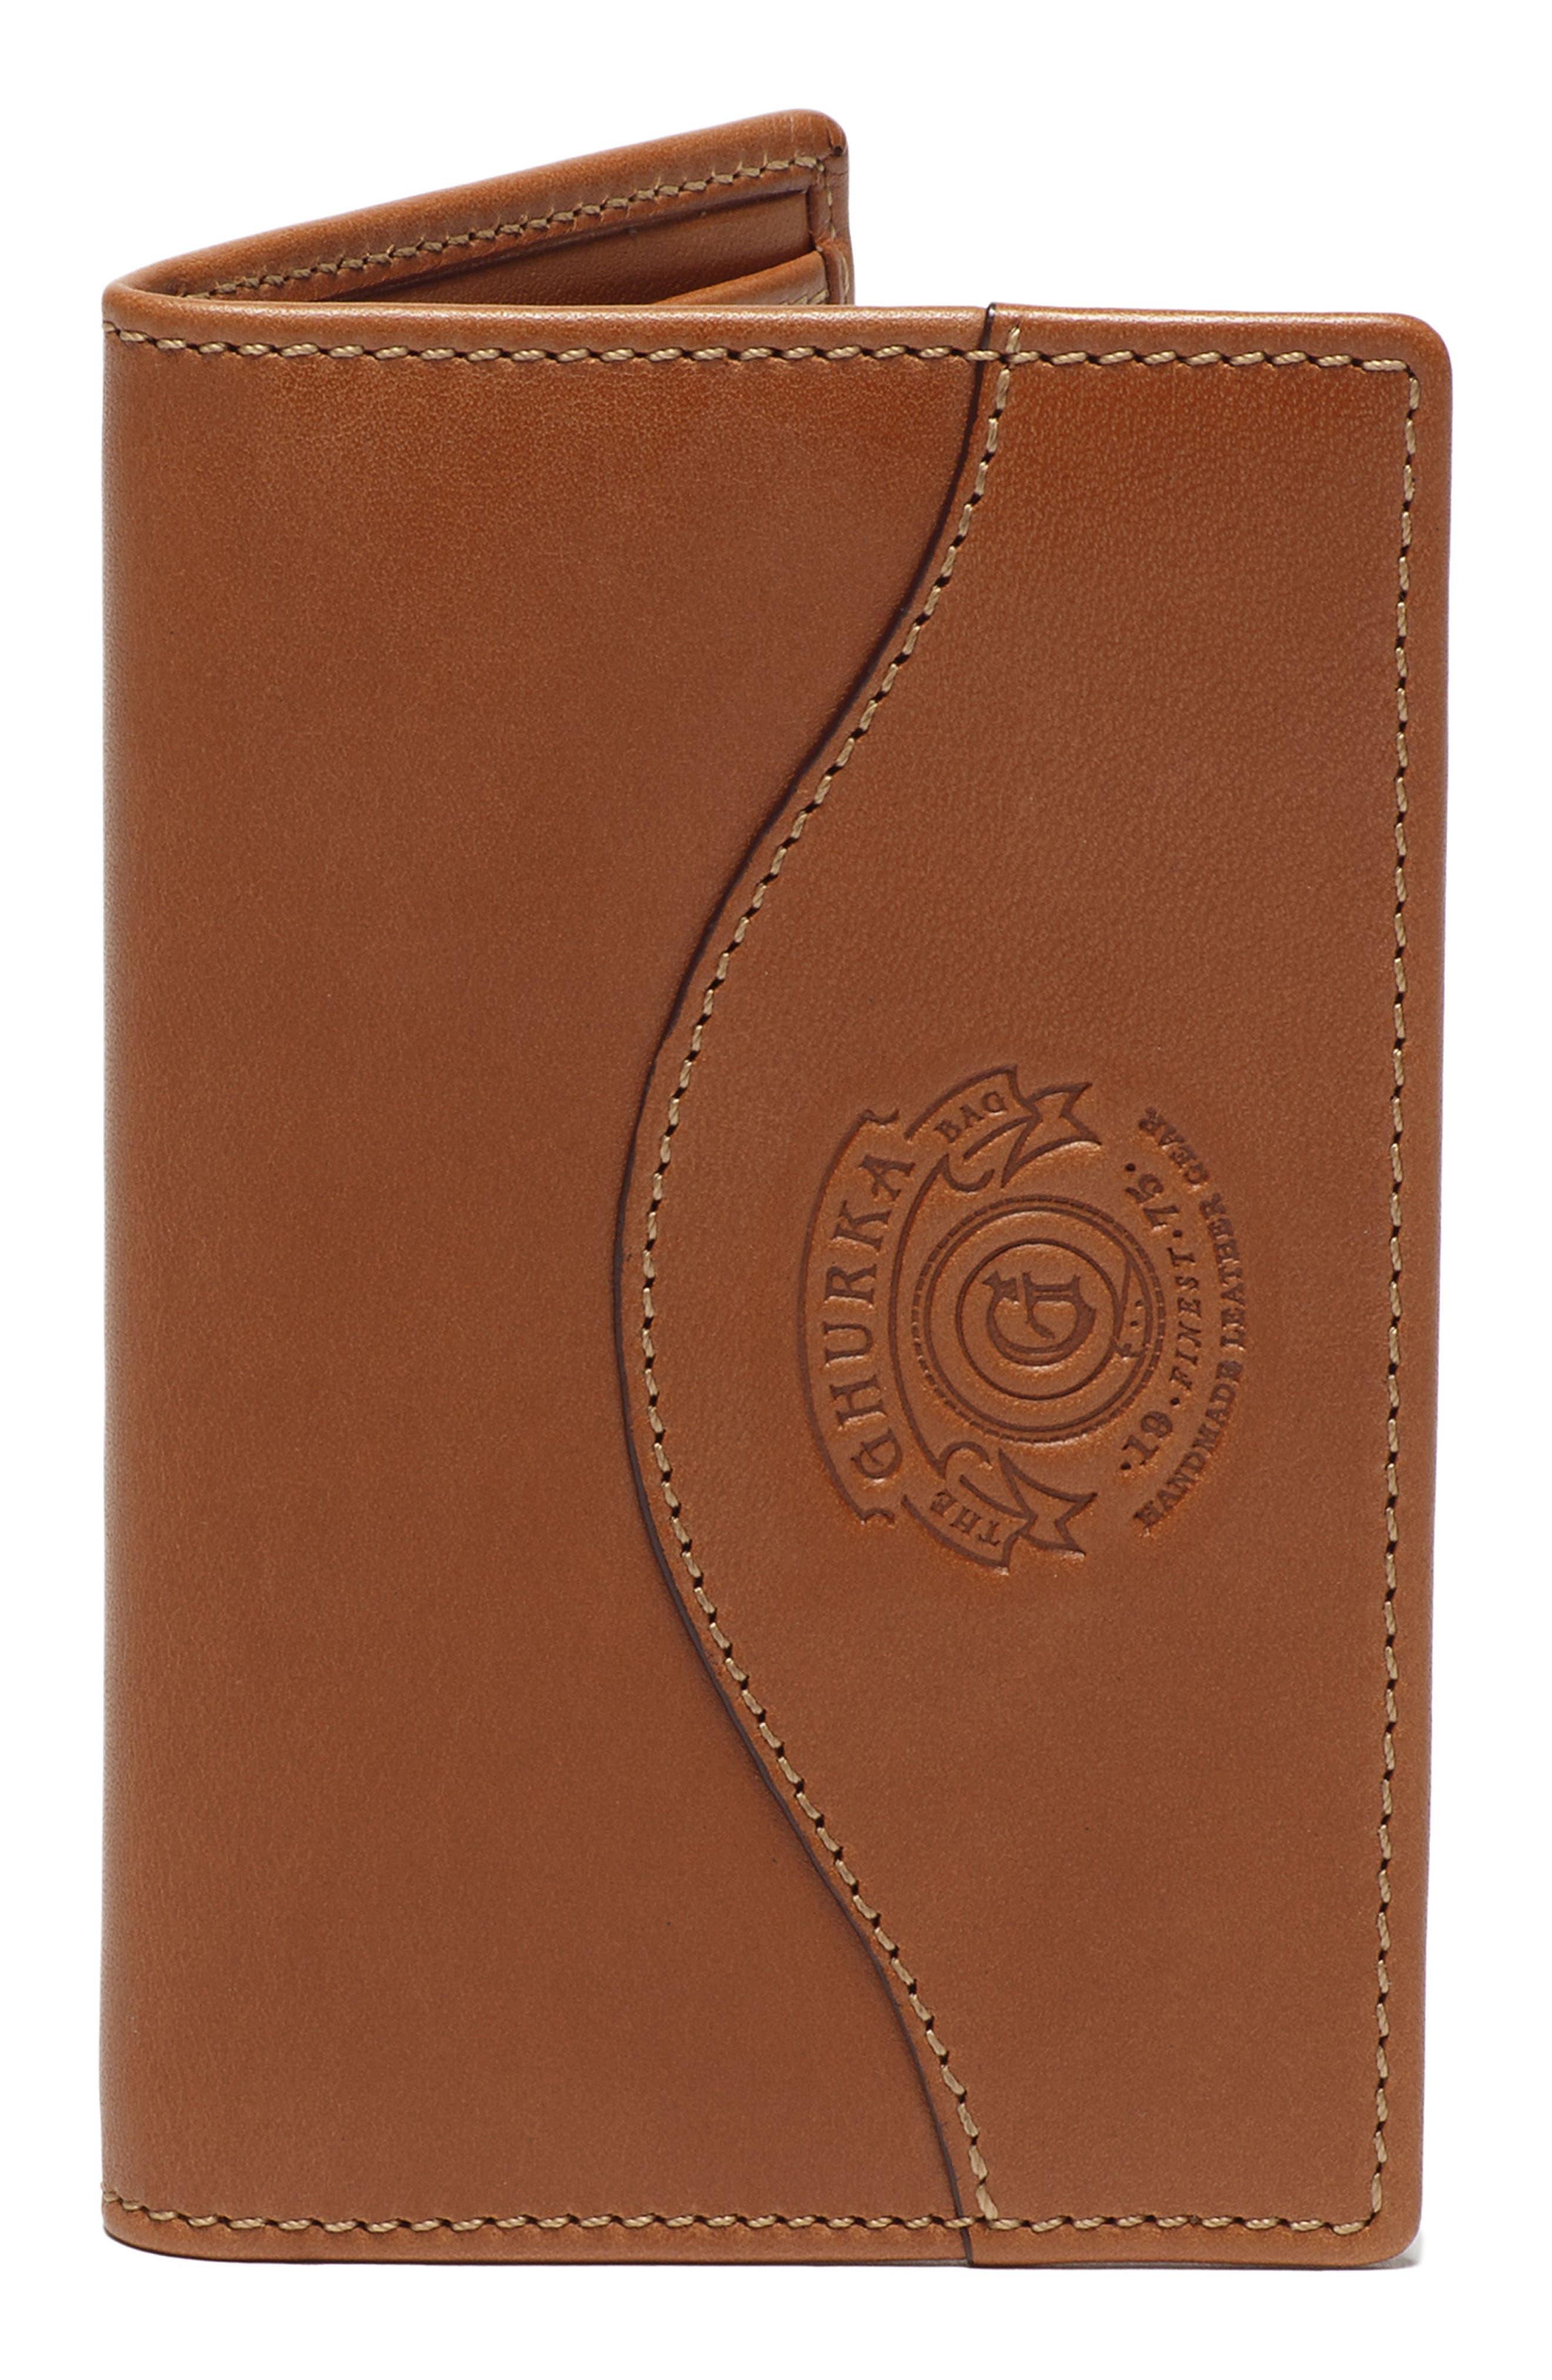 Ghukra Folding Leather Card Case